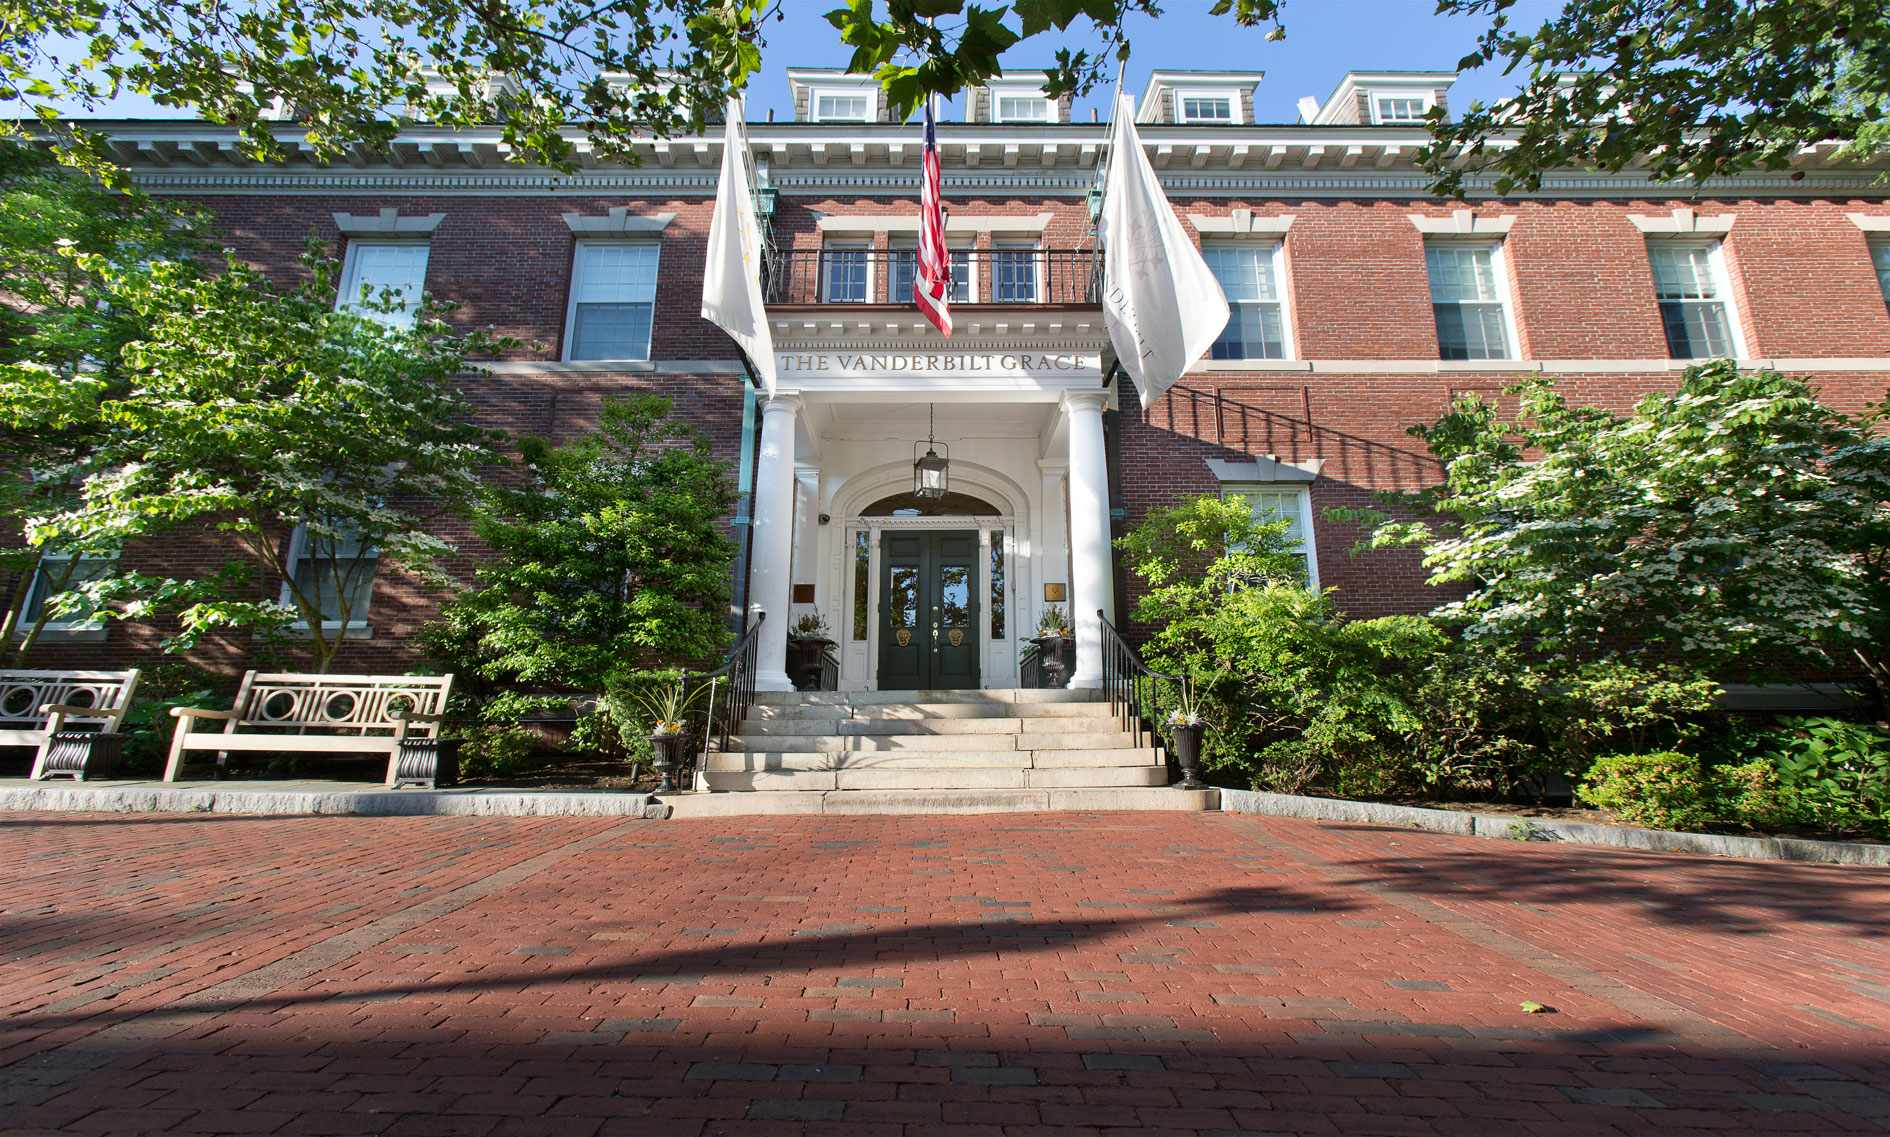 Grace Vanderbilt hotel, Rhode Island